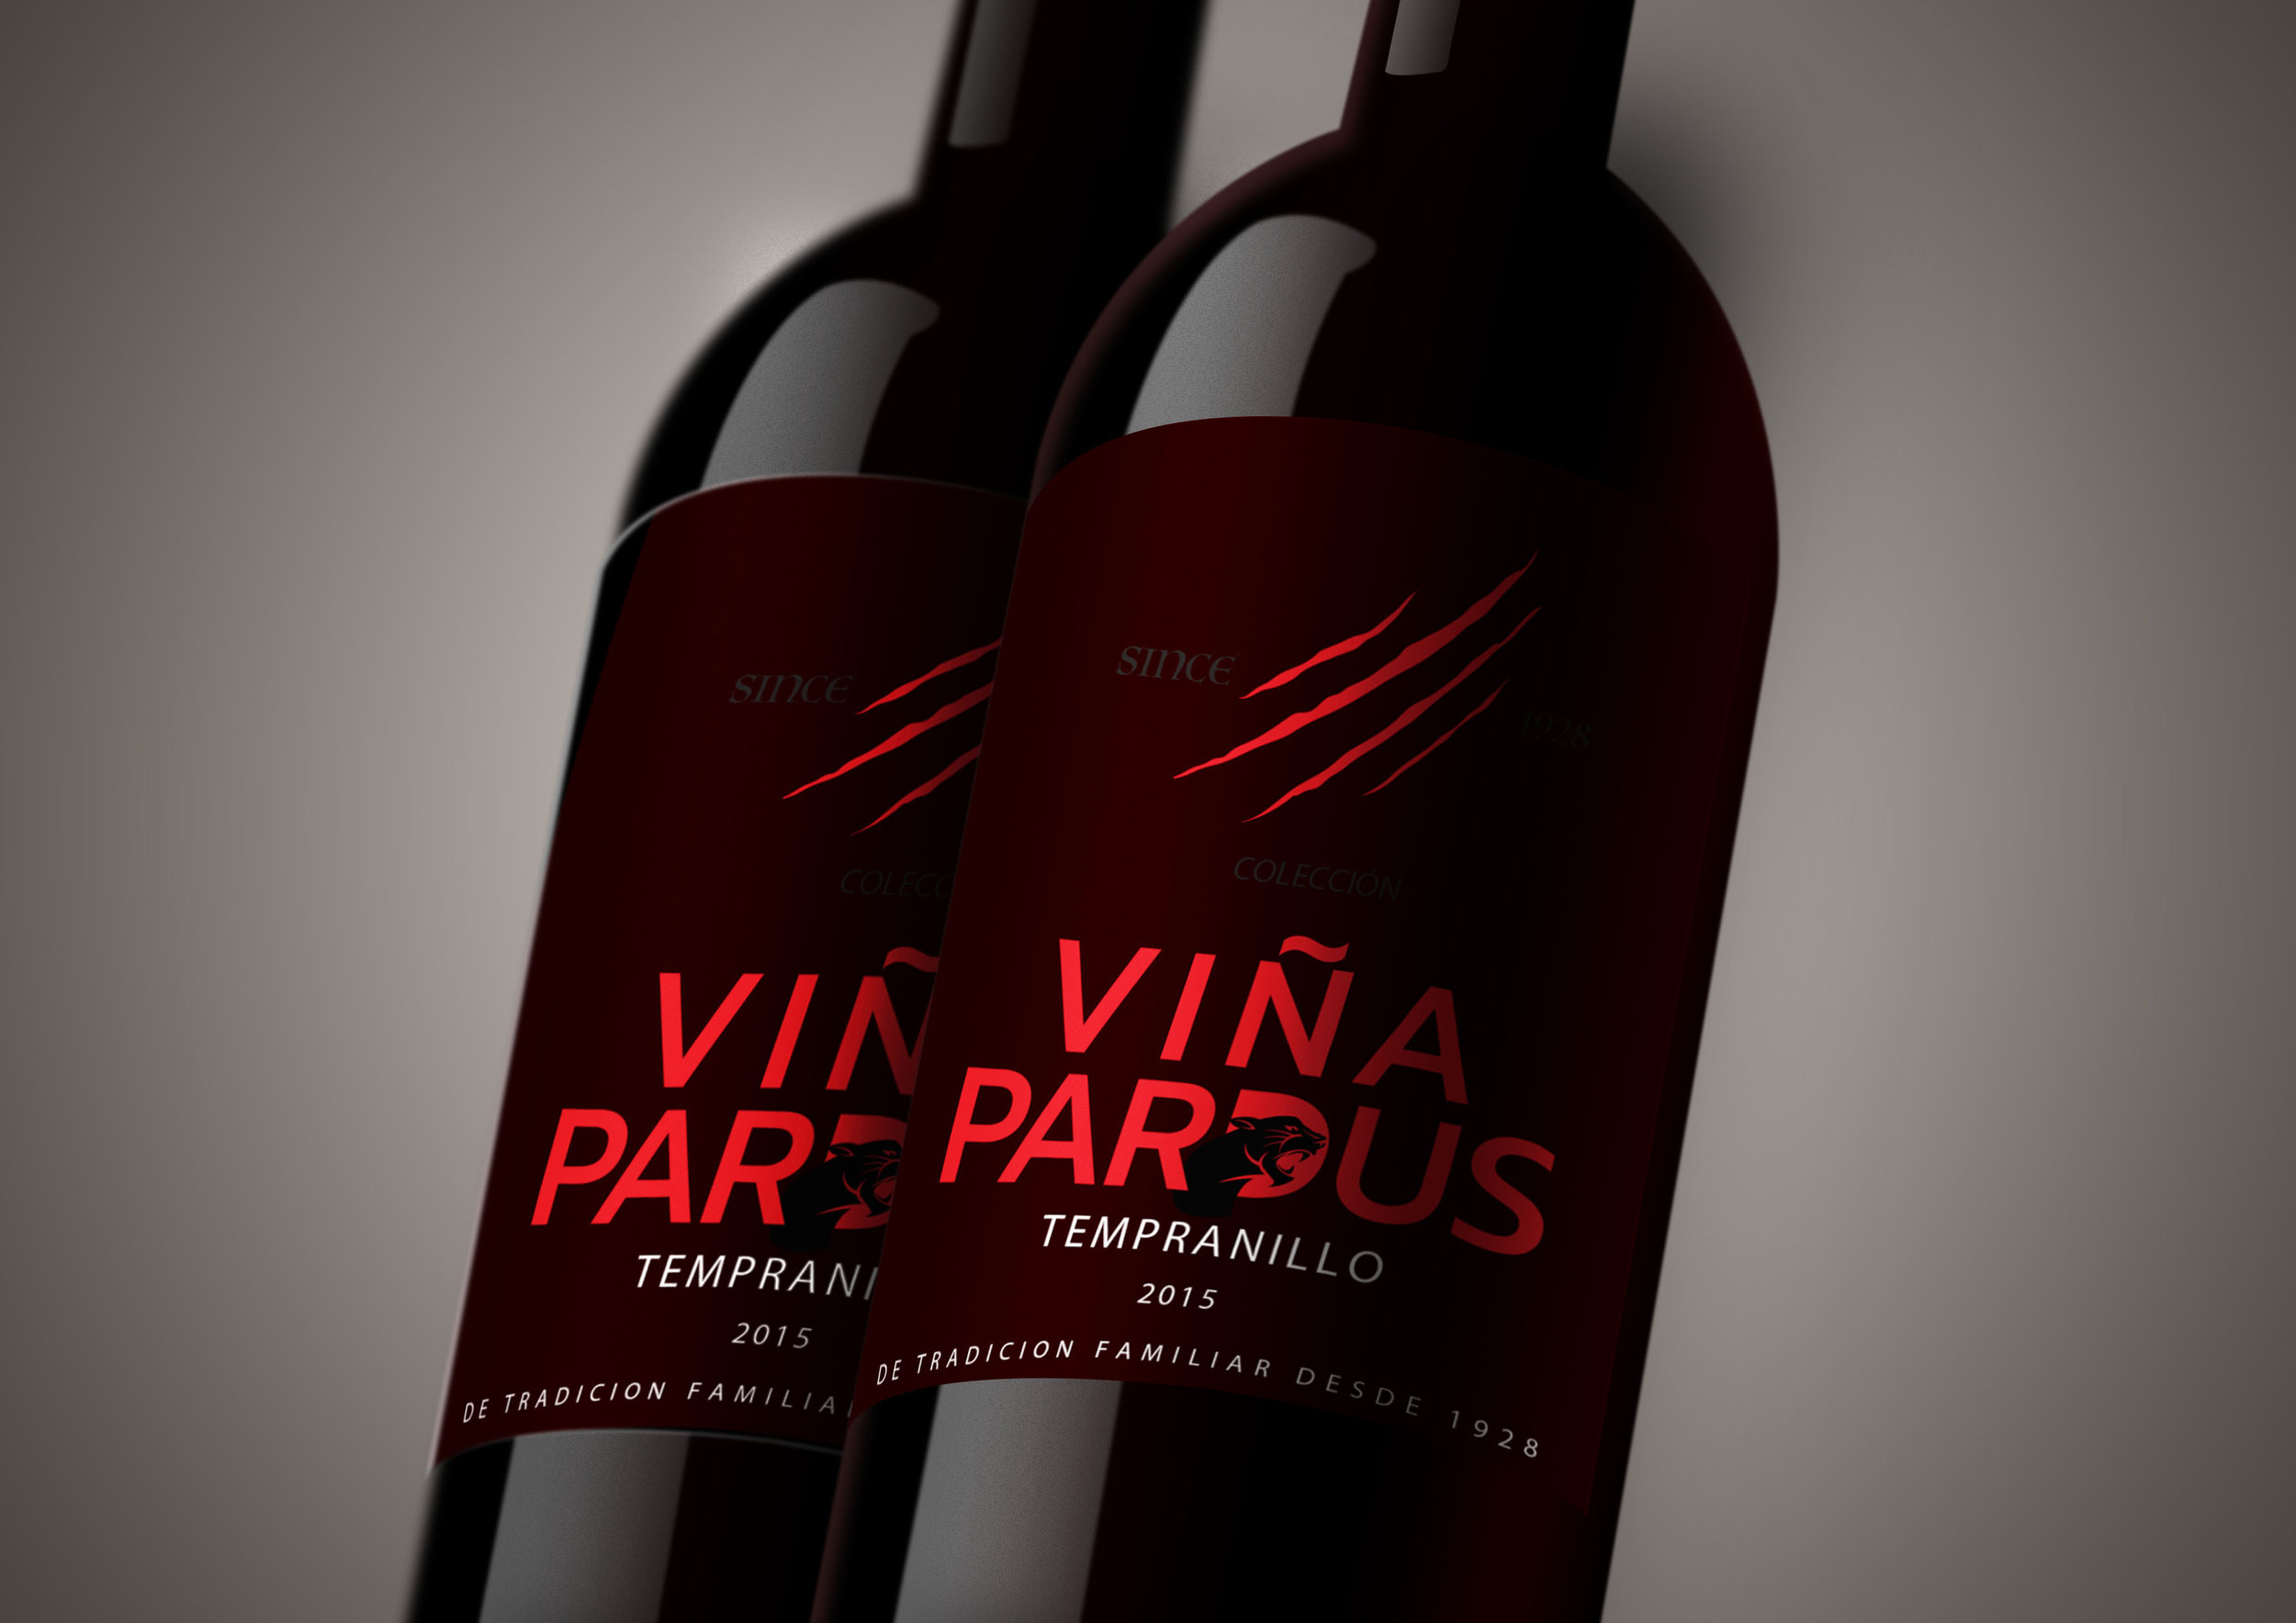 Vina Pardus 2 Bottle Mock Up.jpg